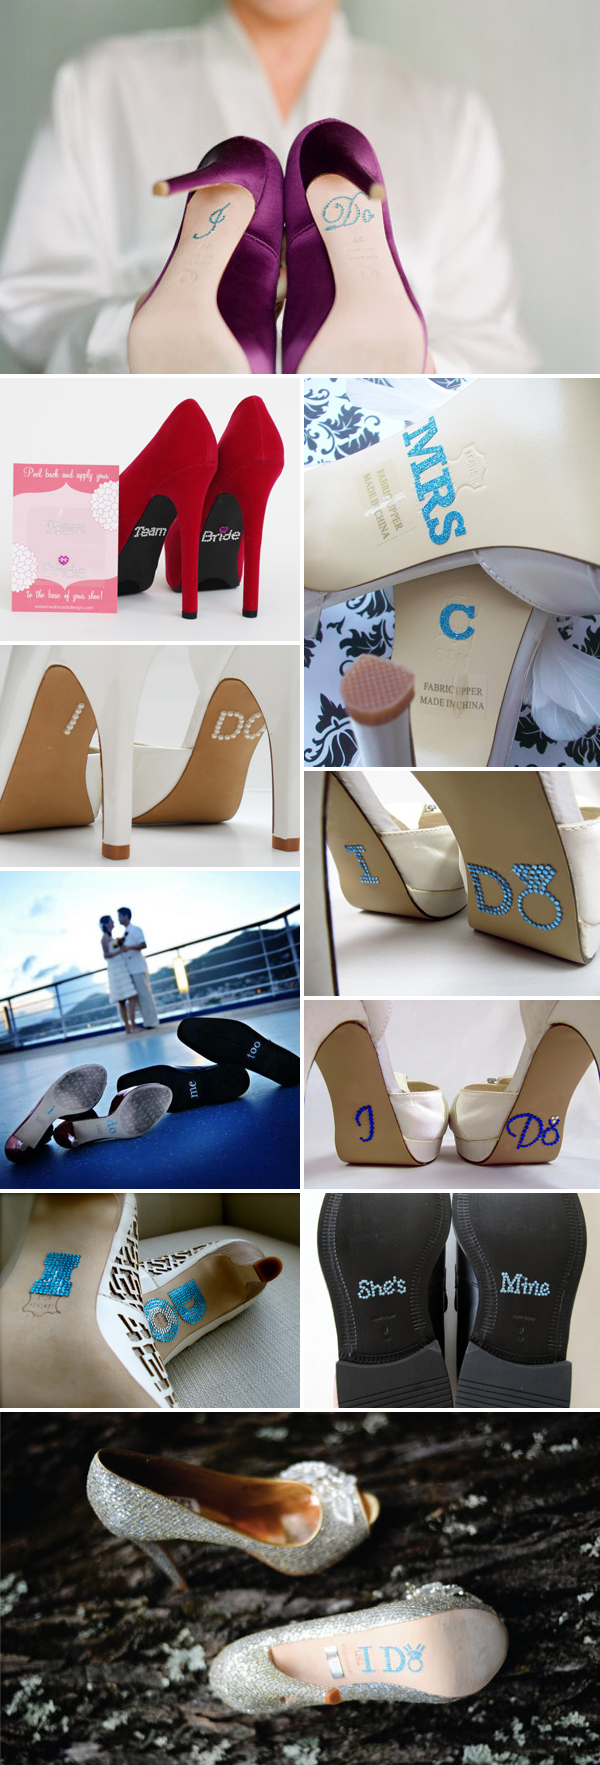 ST_bridal_shoe_stickers